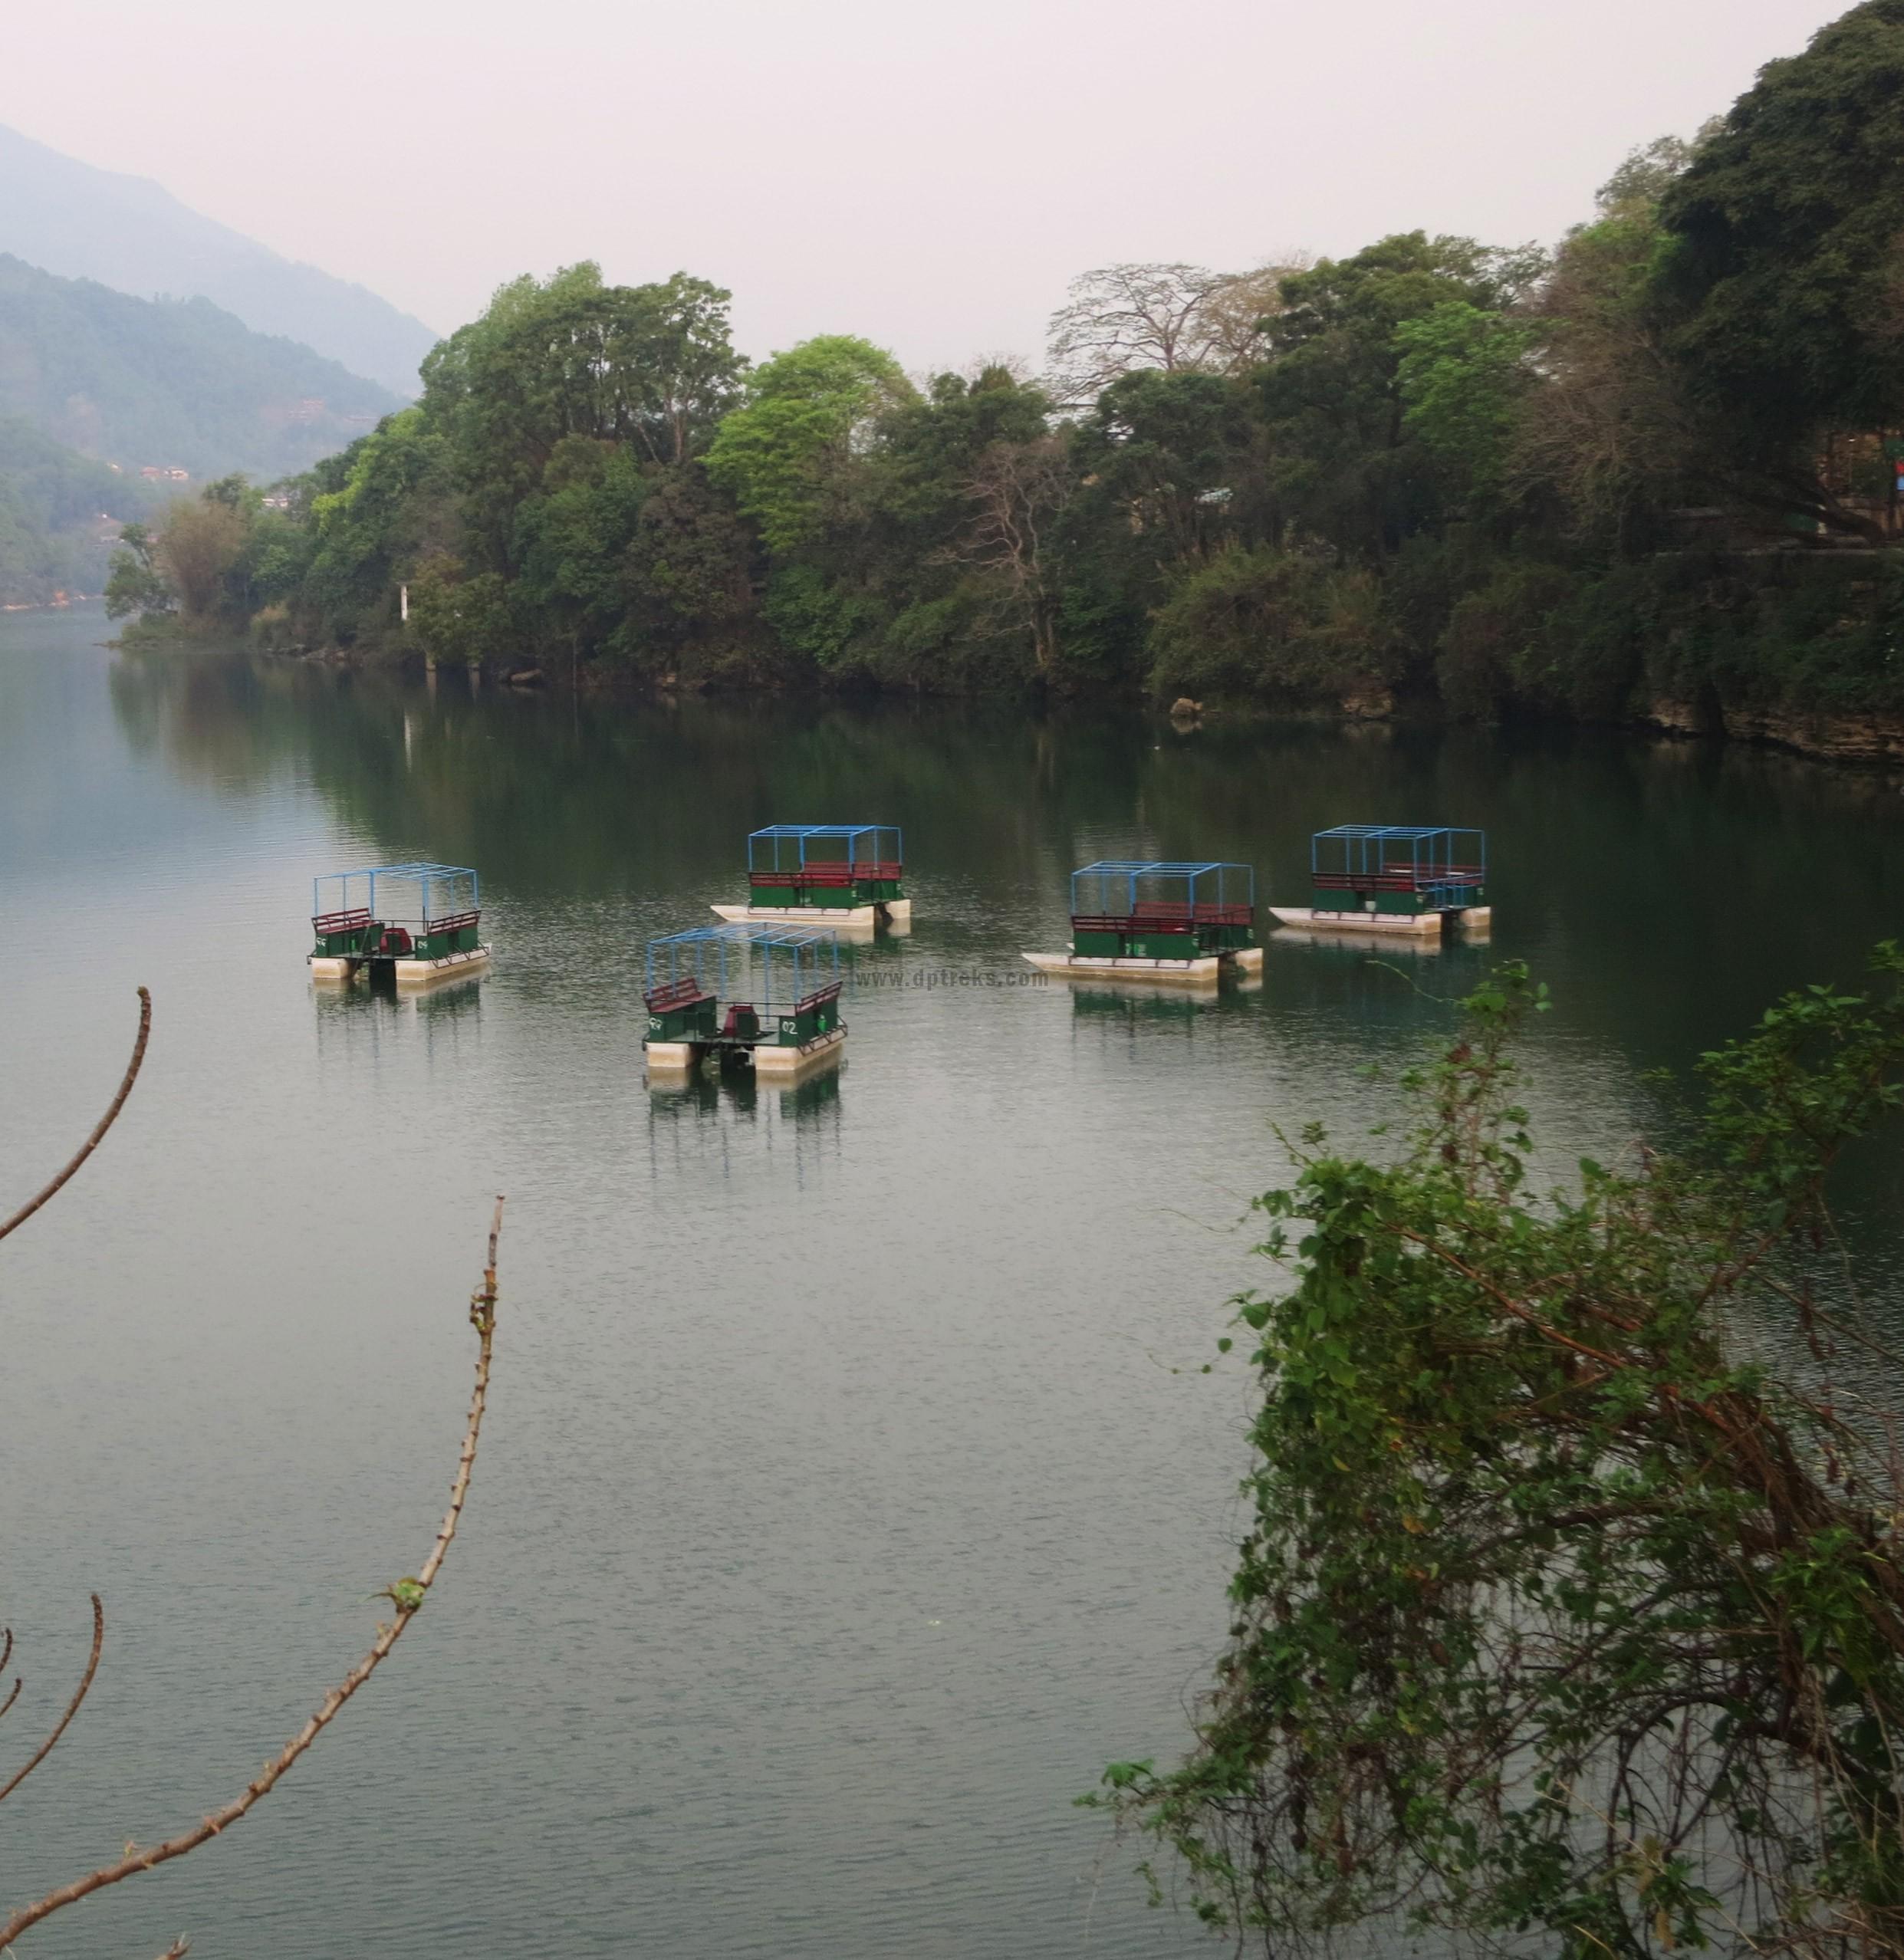 Excursion in Annpurna